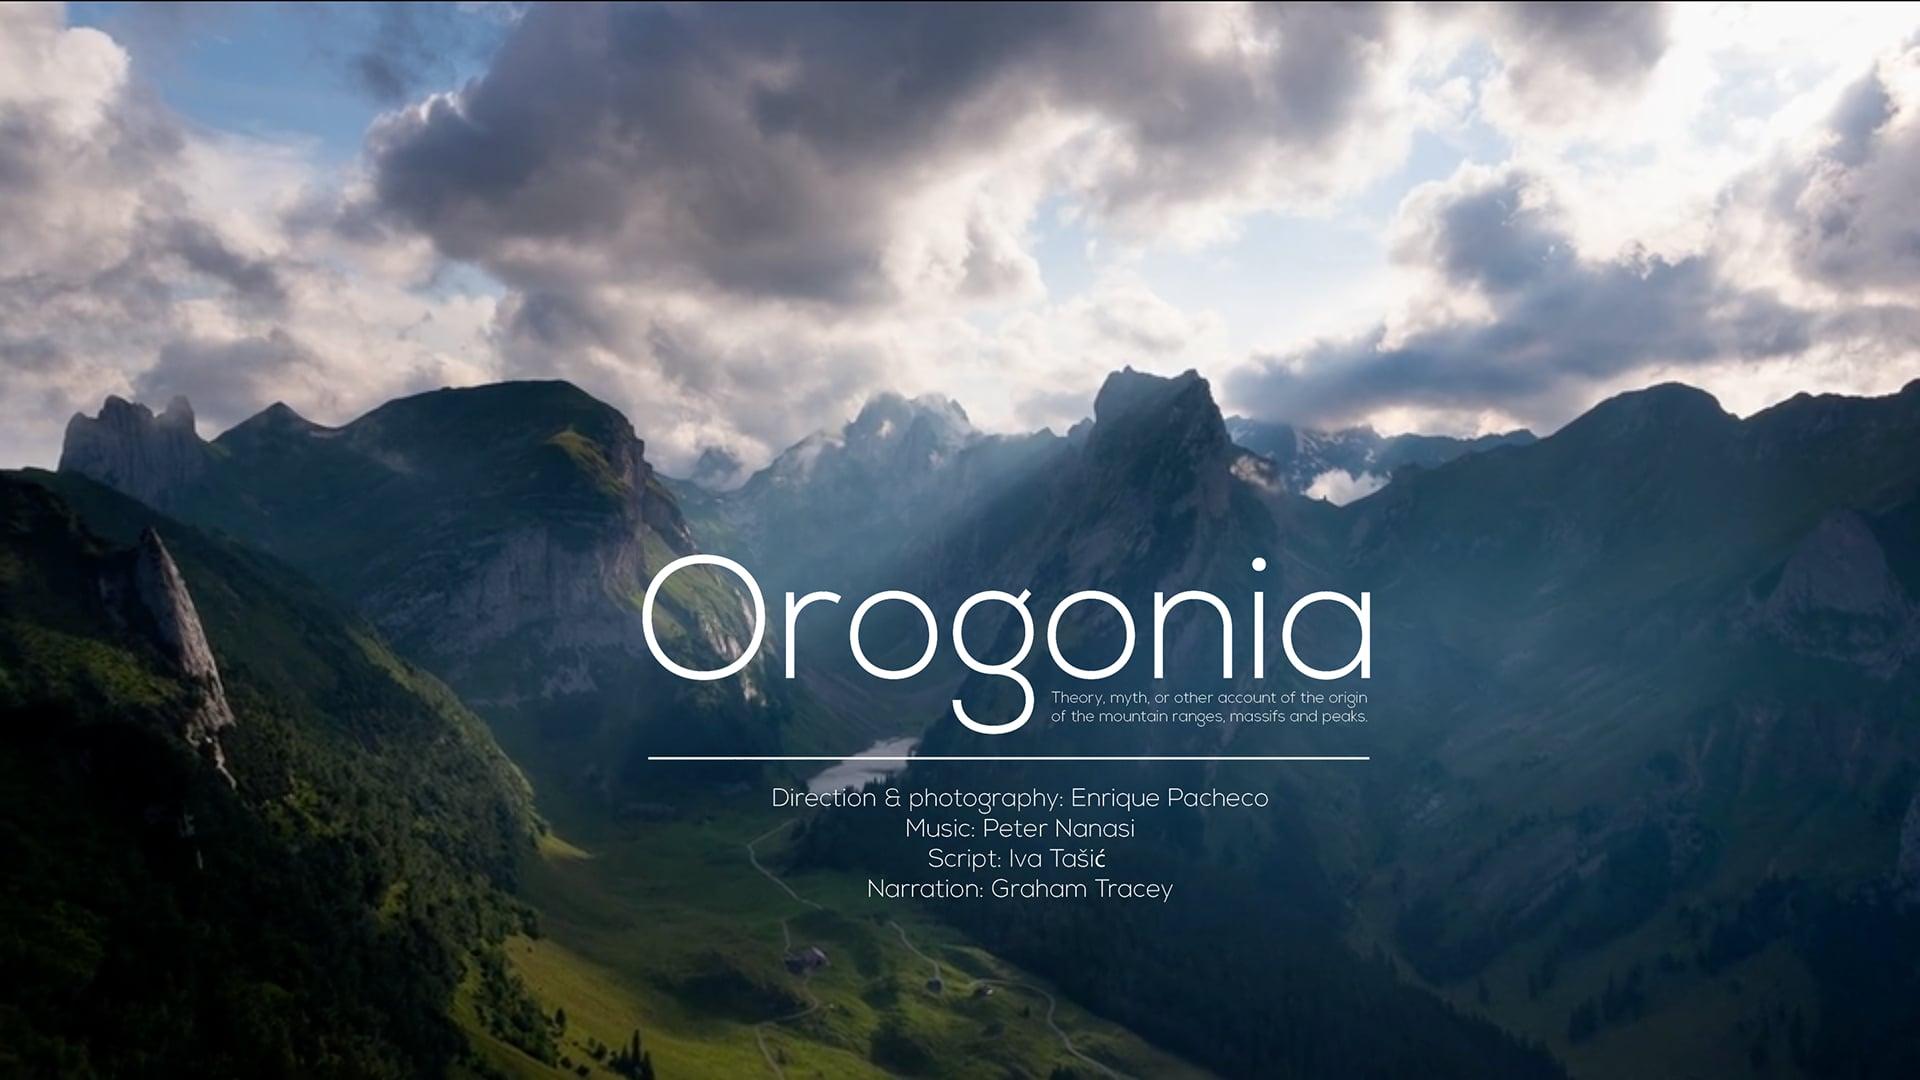 Orogonia